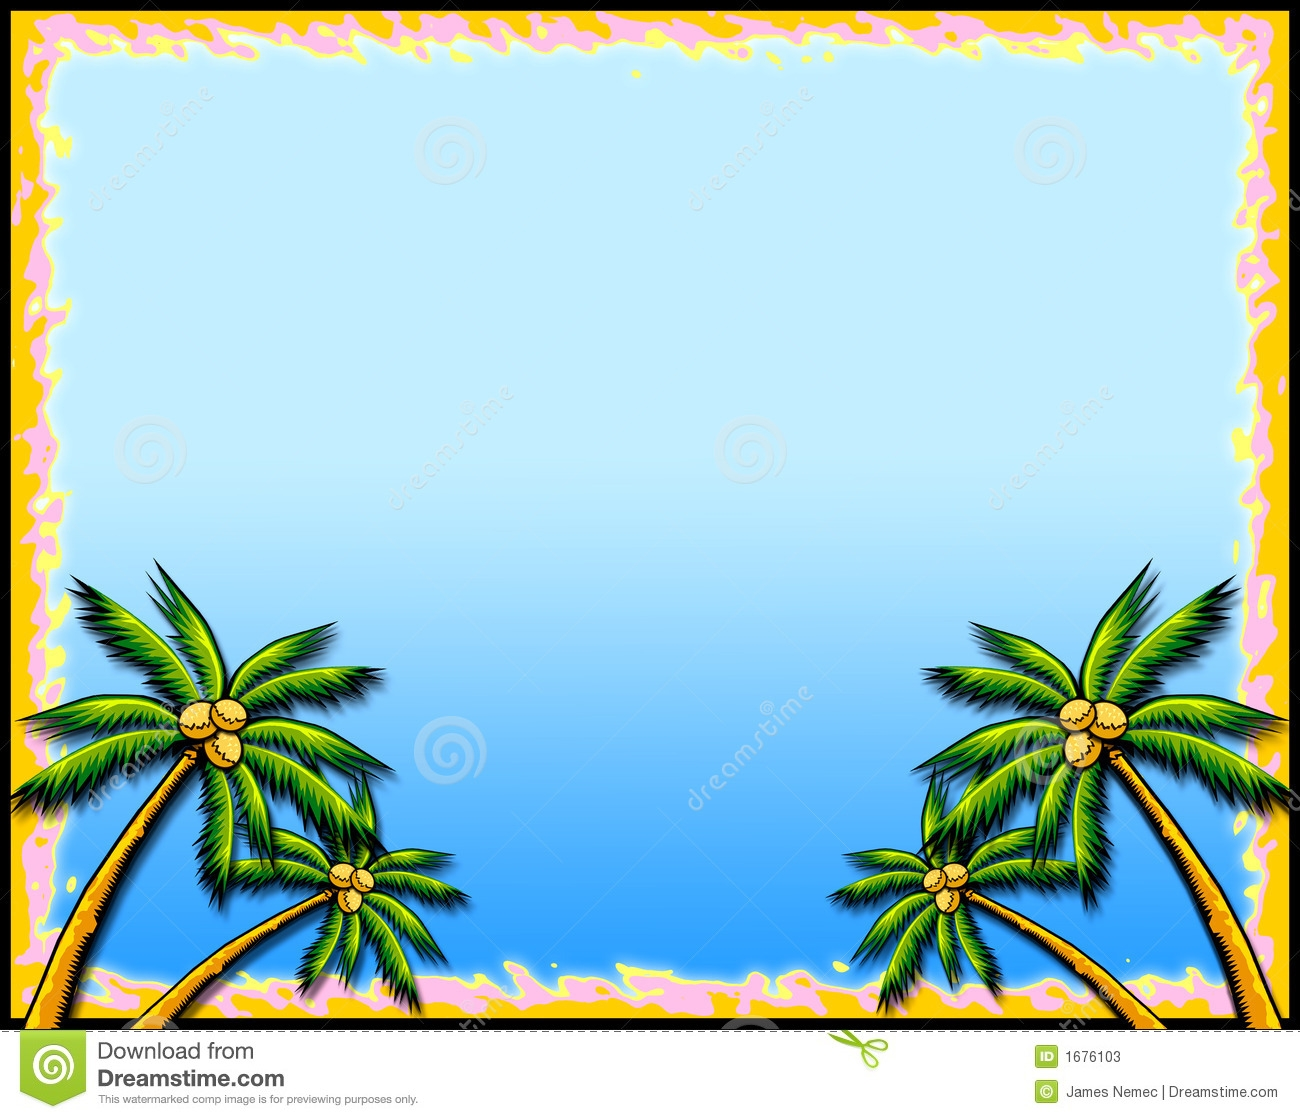 Tropical Palm Tree Clipart Border.